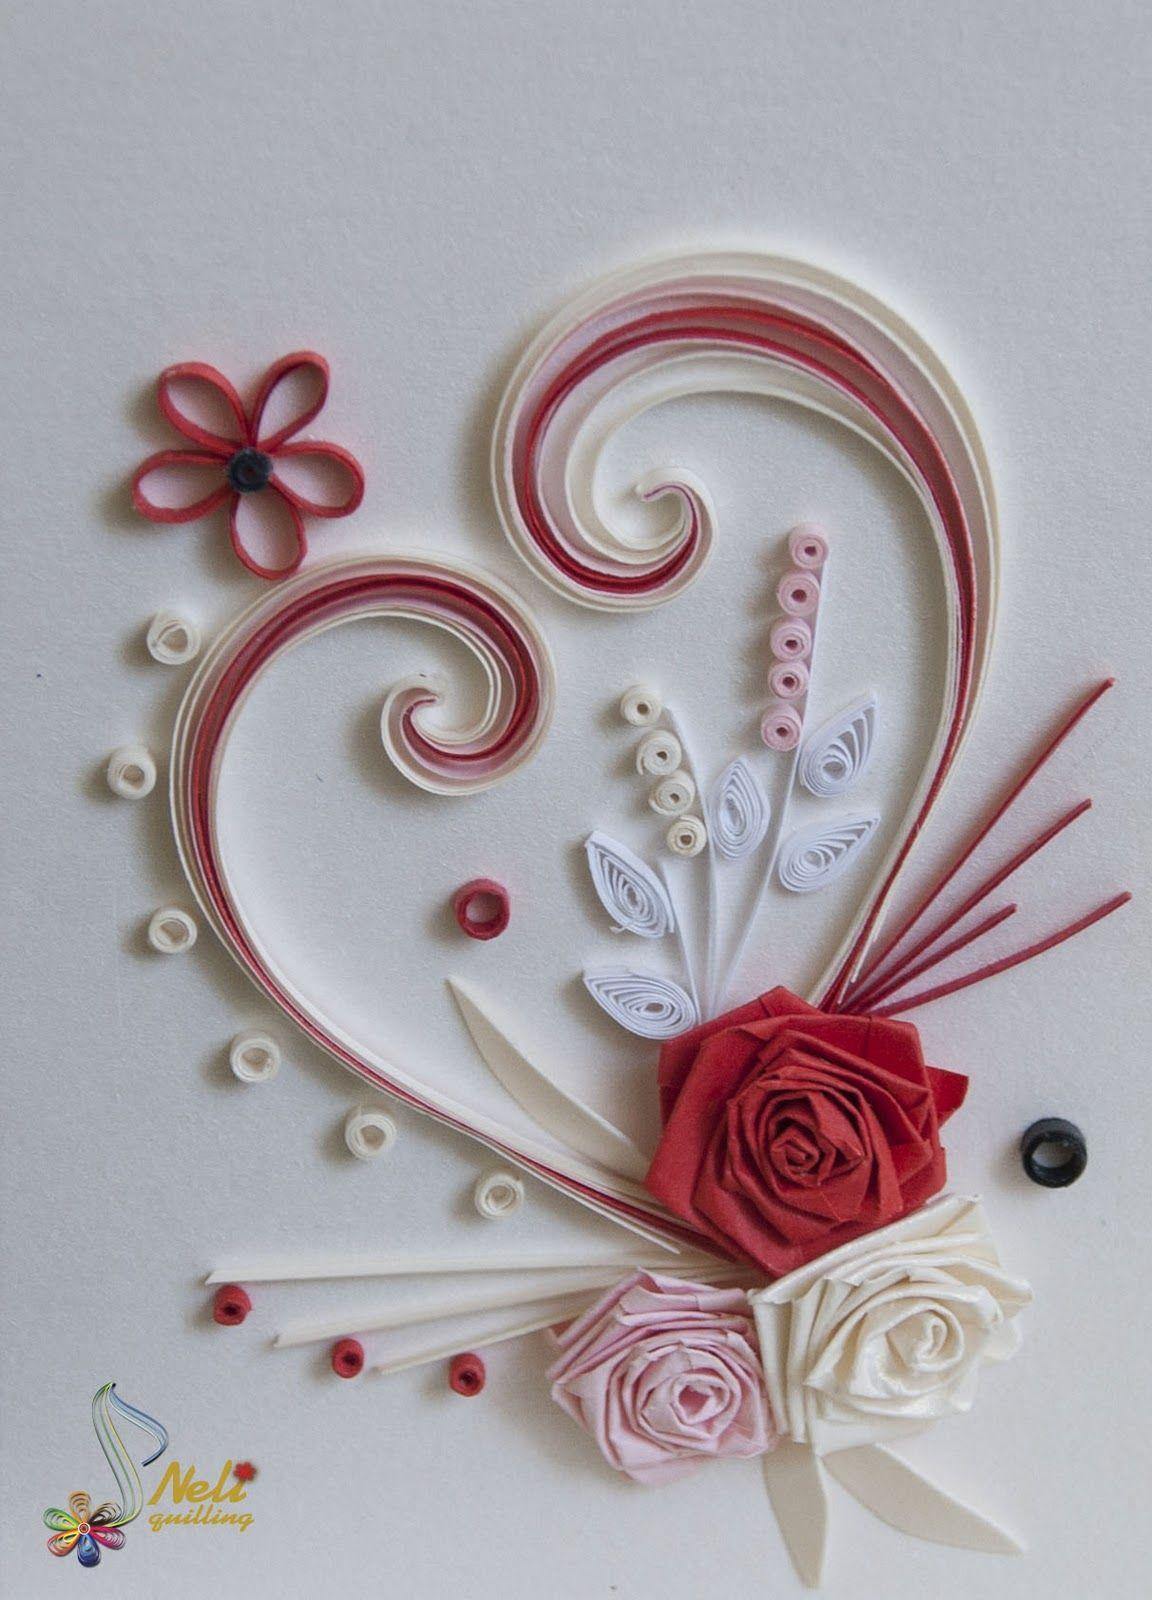 Открытки с квиллинг розами